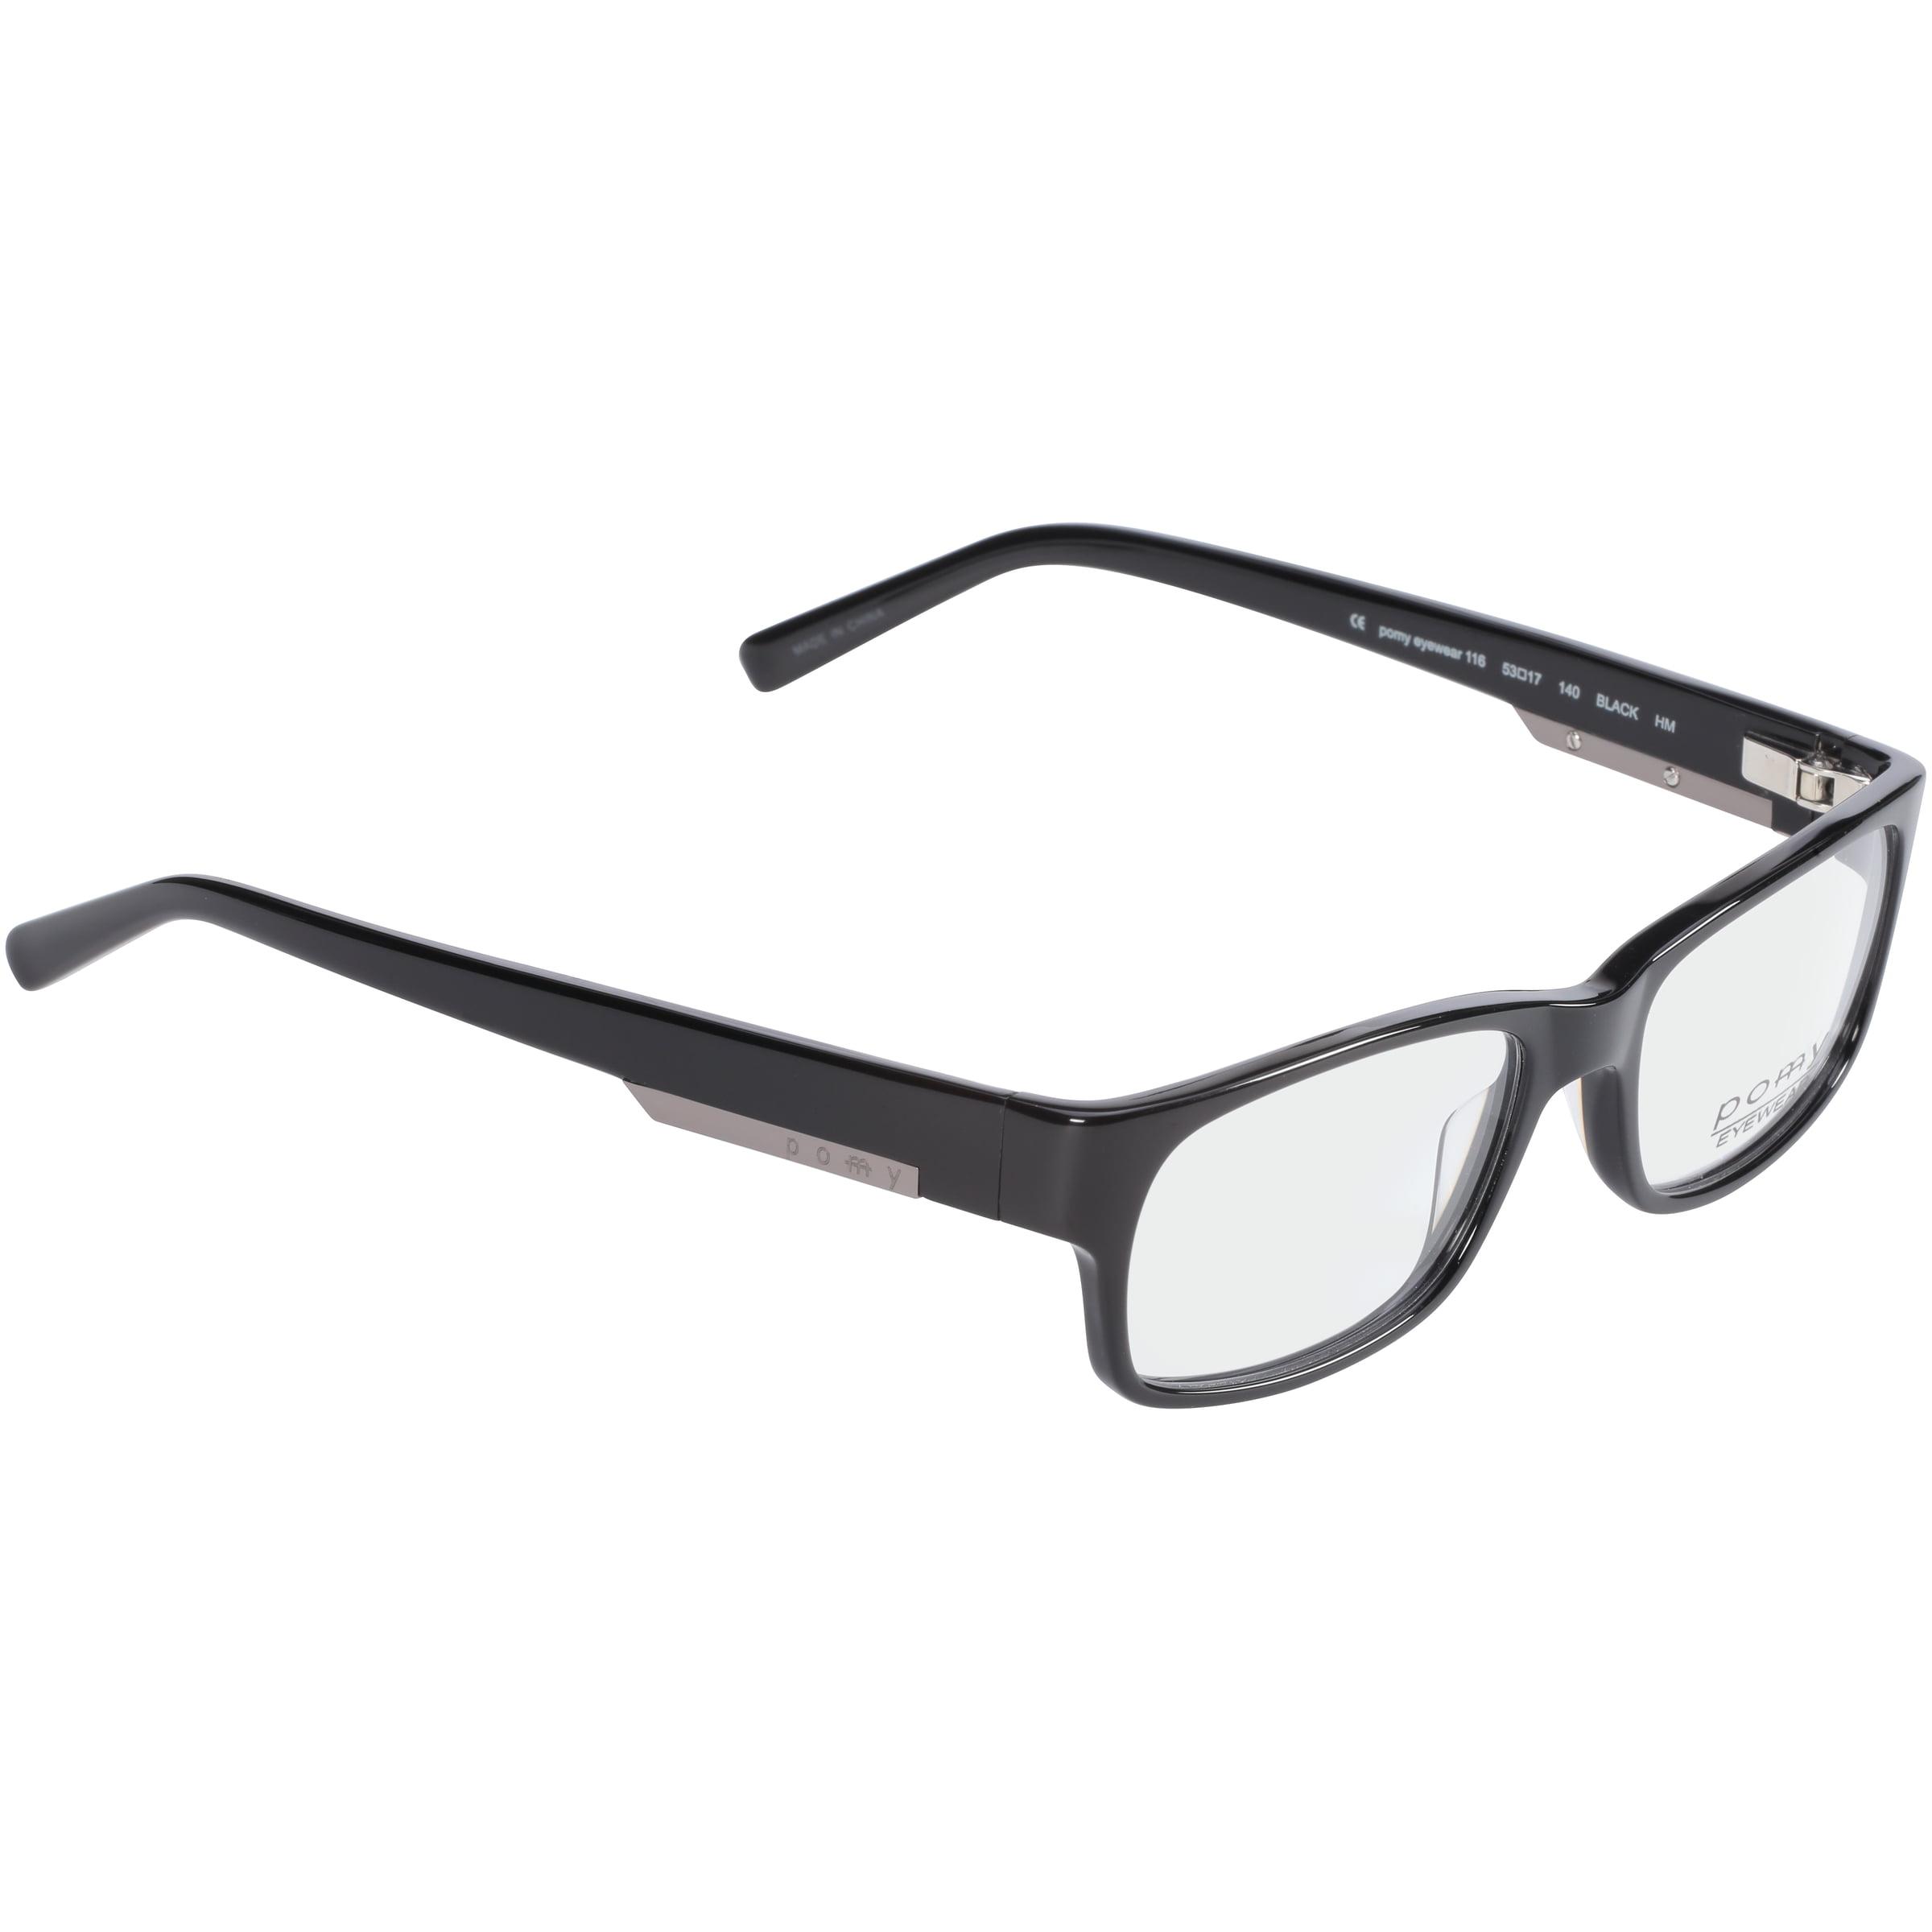 pomy eyewear rxable eyeglass frames 116 black walmartcom